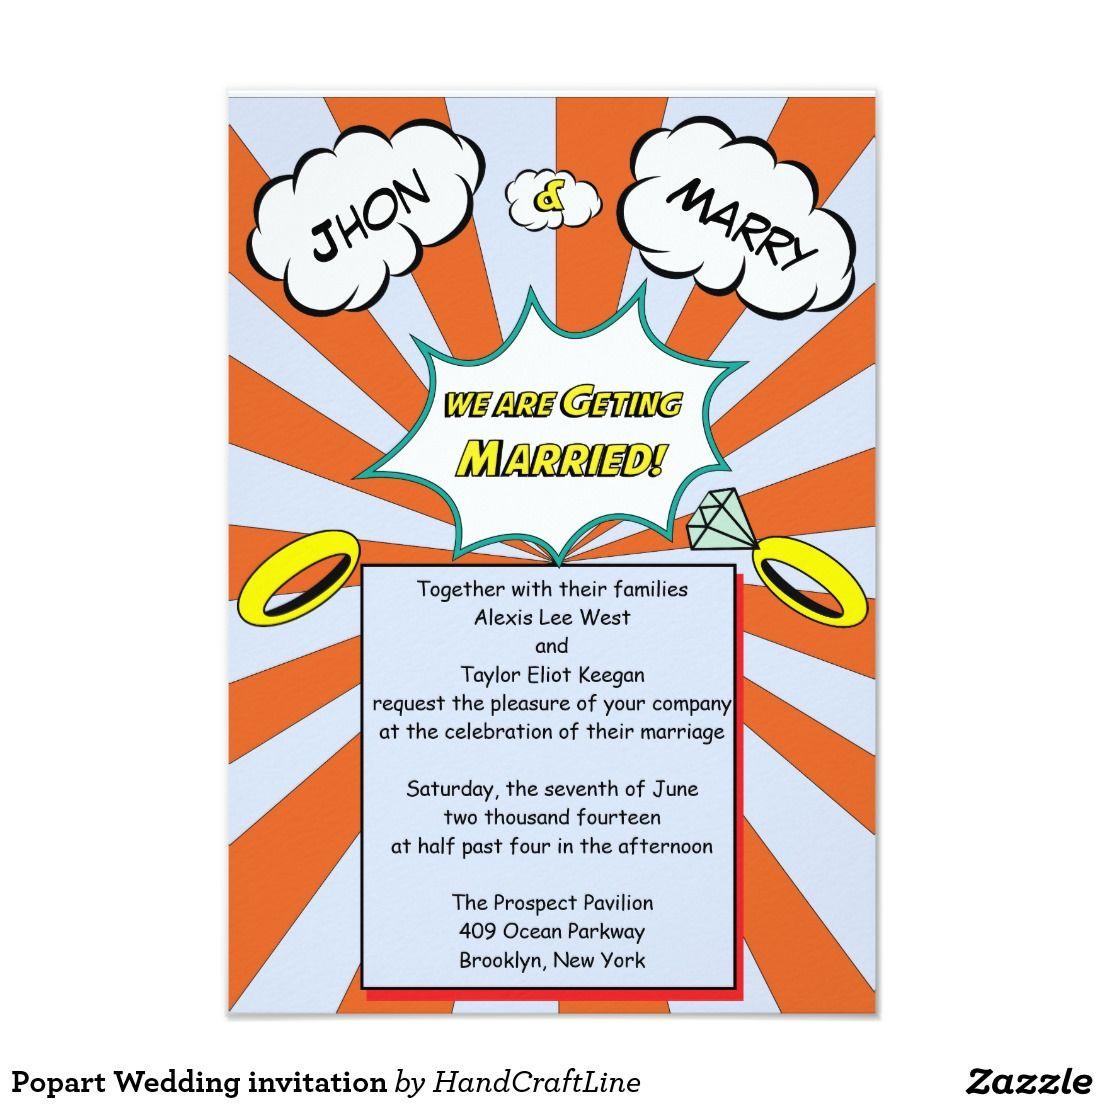 Popart Wedding invitation | Pinterest | Wedding and Wedding